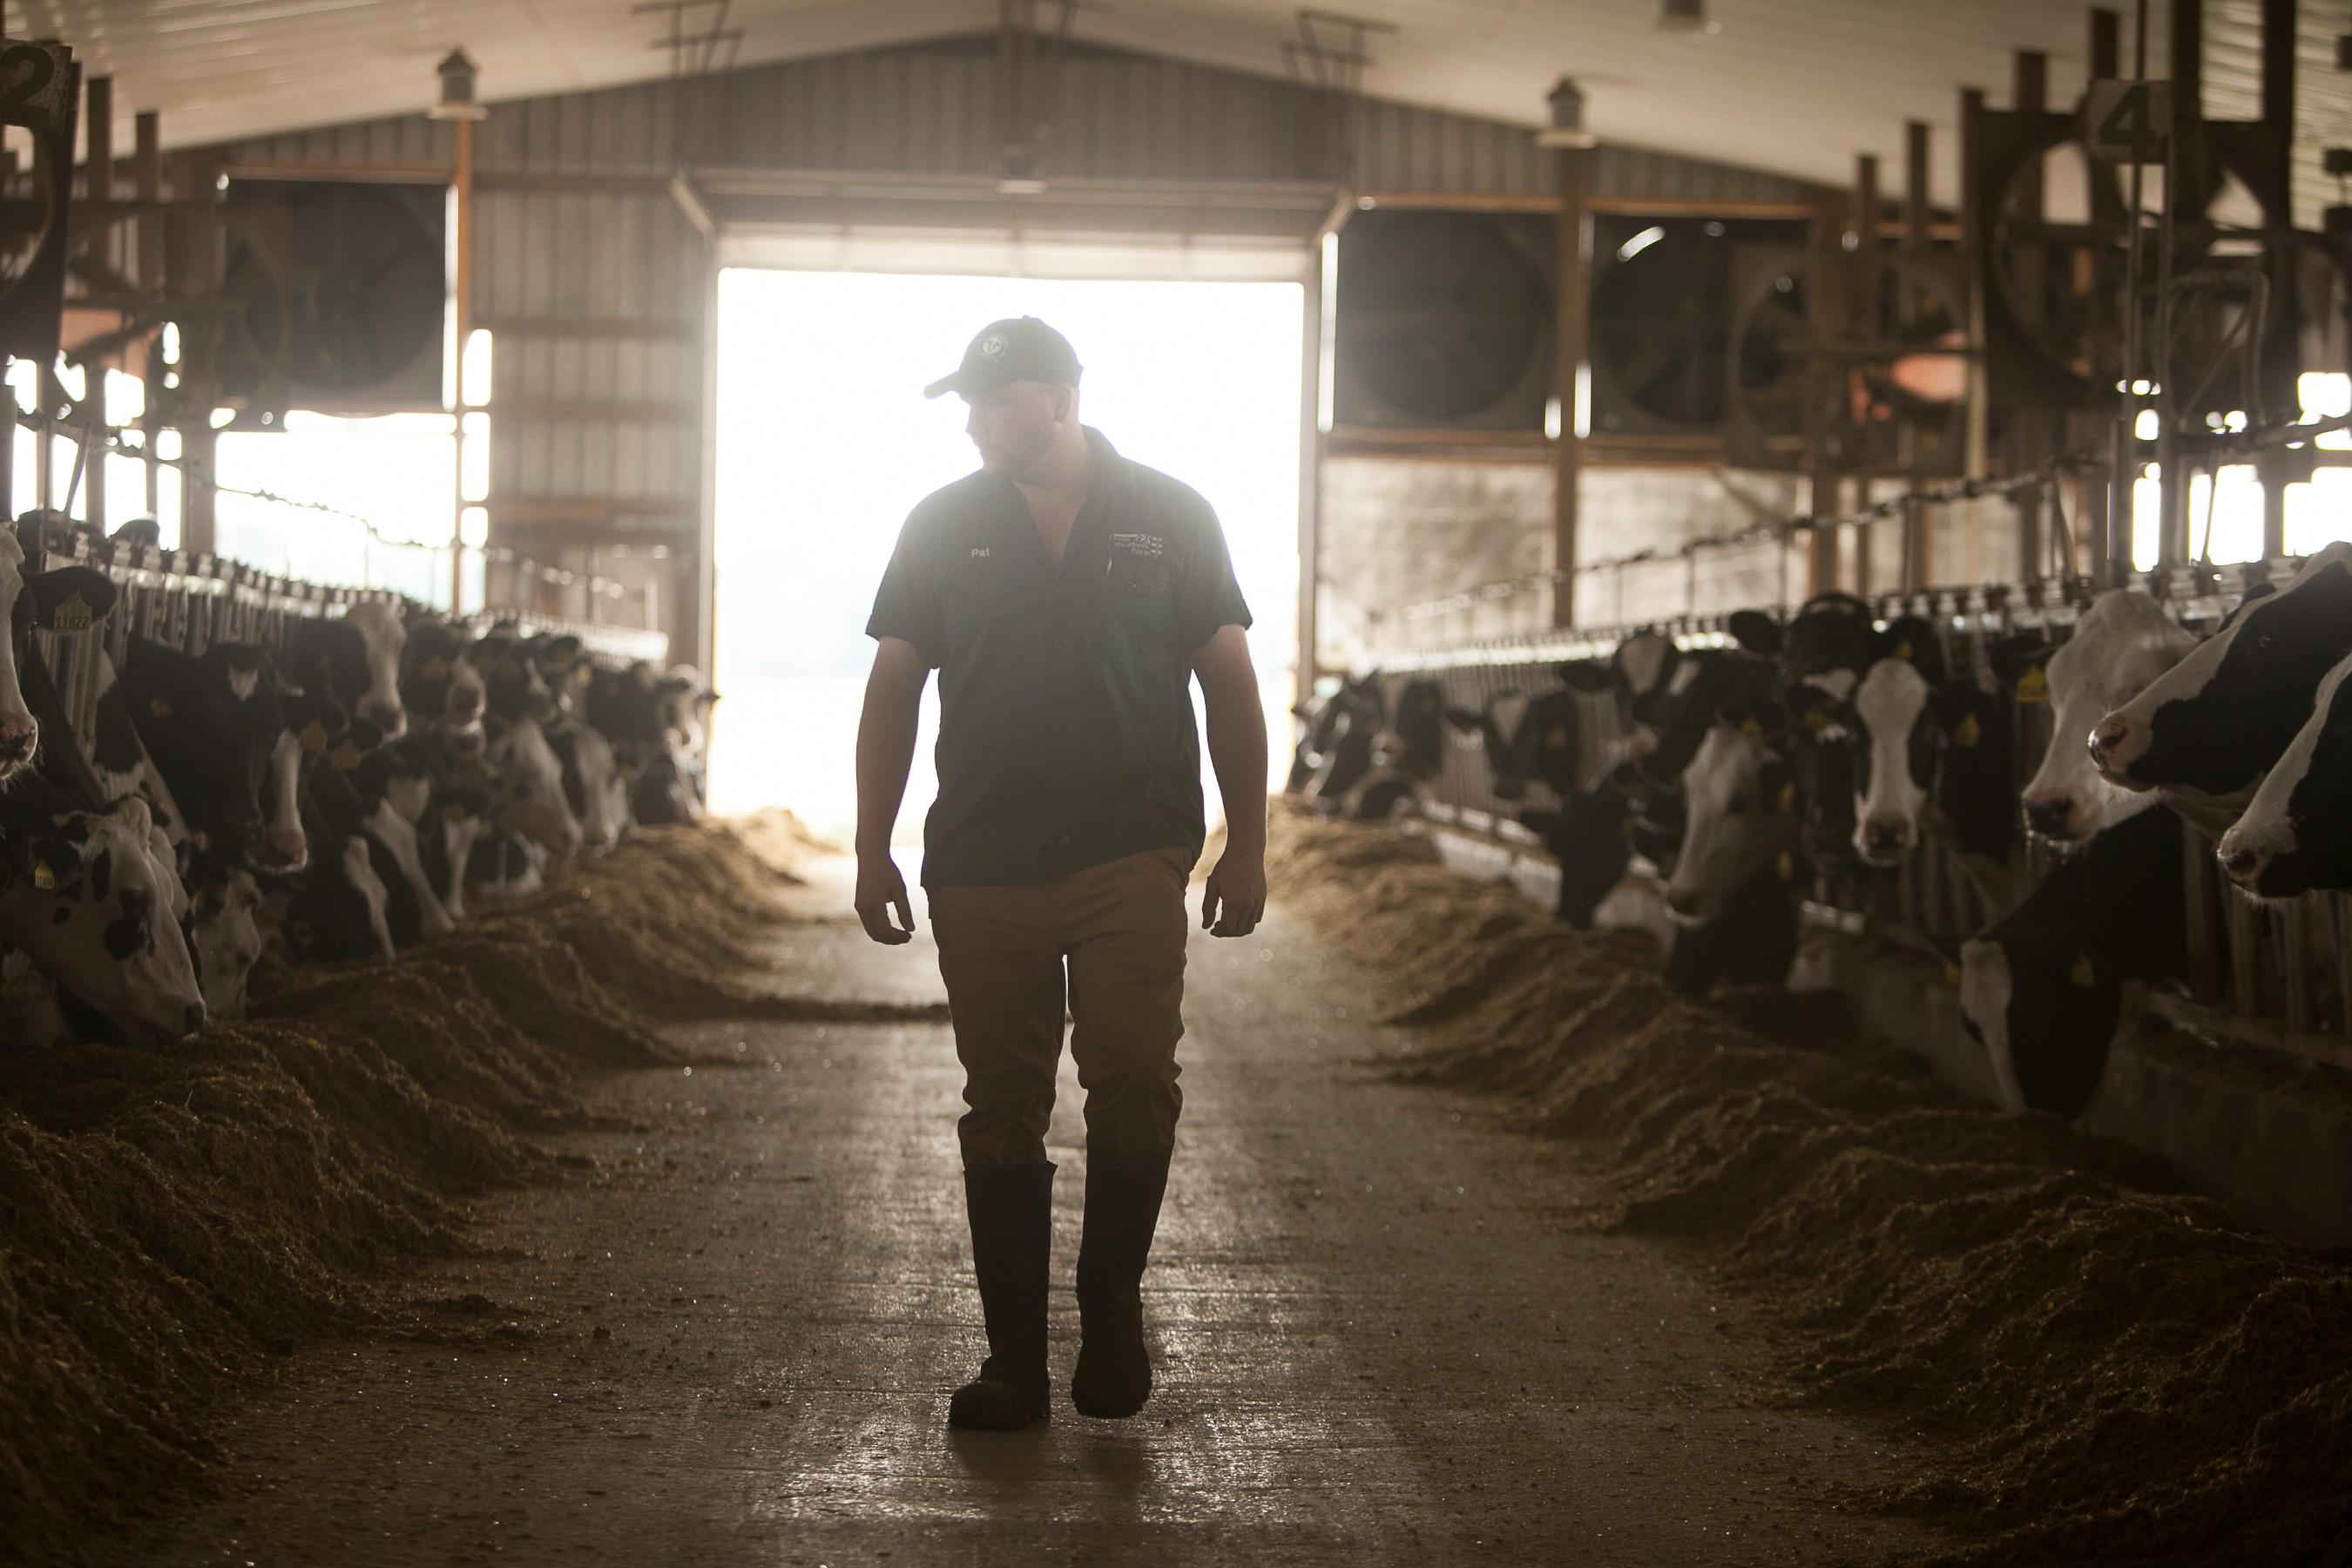 U.S. Dairy Advances Journey to Net Zero Carbon Emissions by 2050